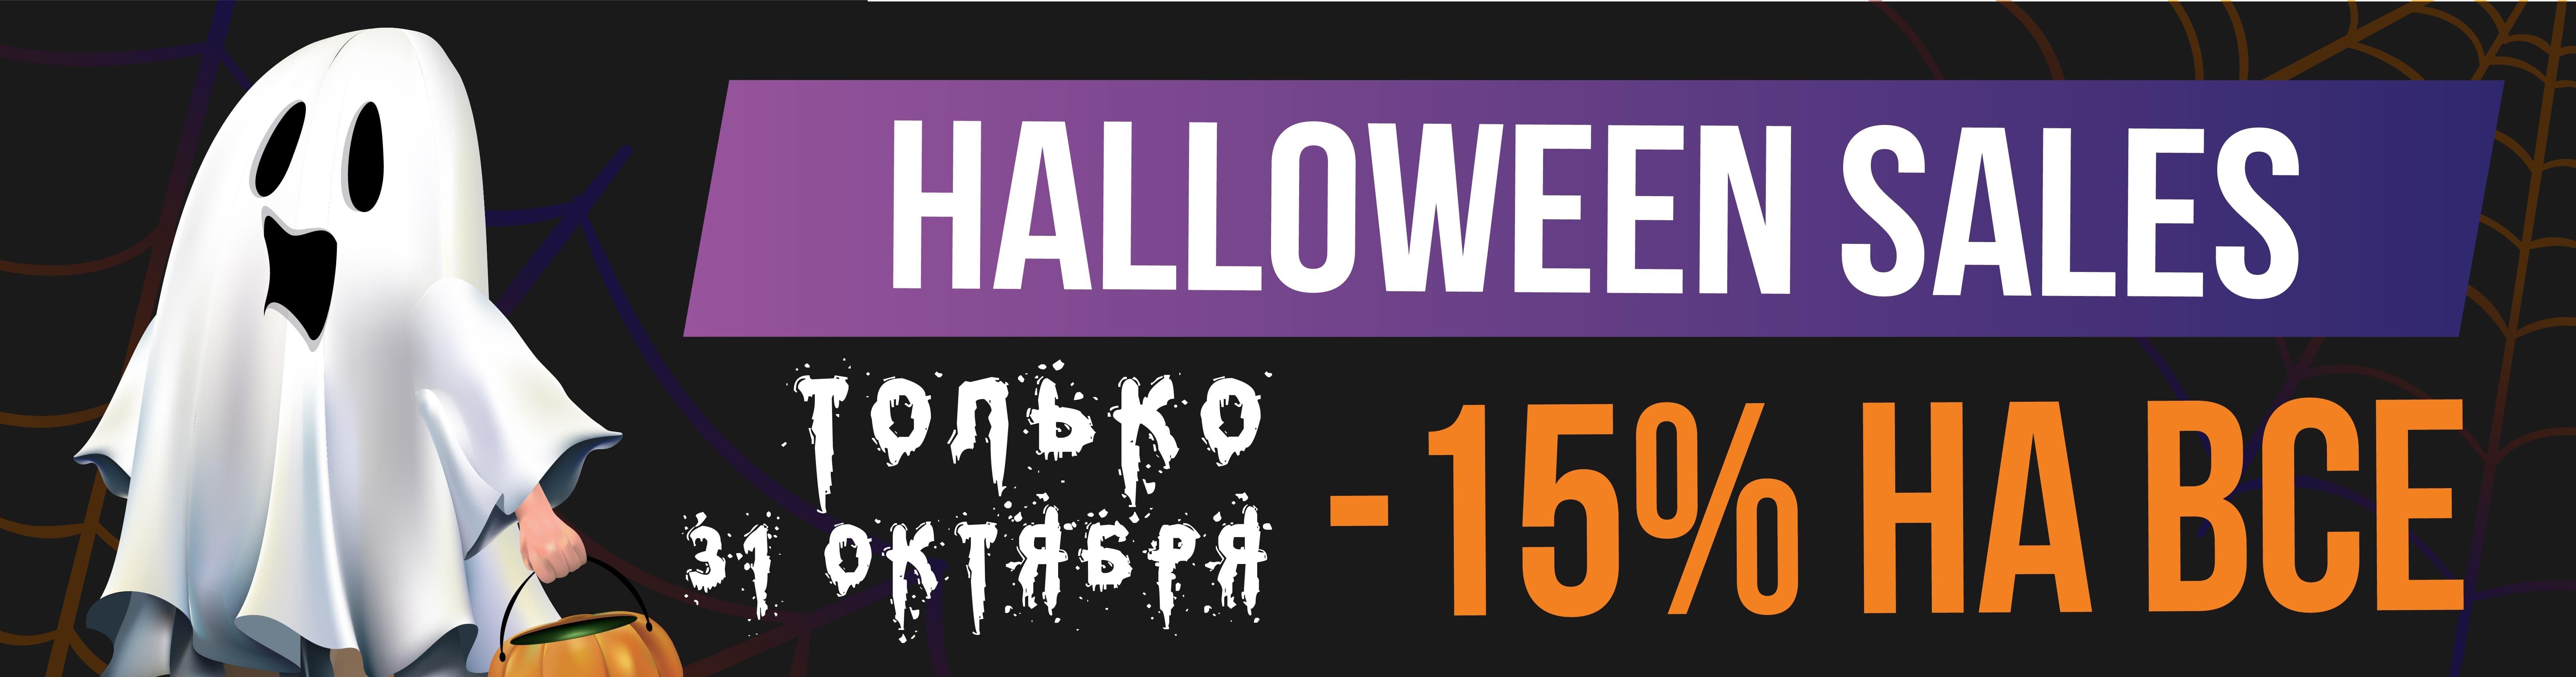 Halloween Sale 2018